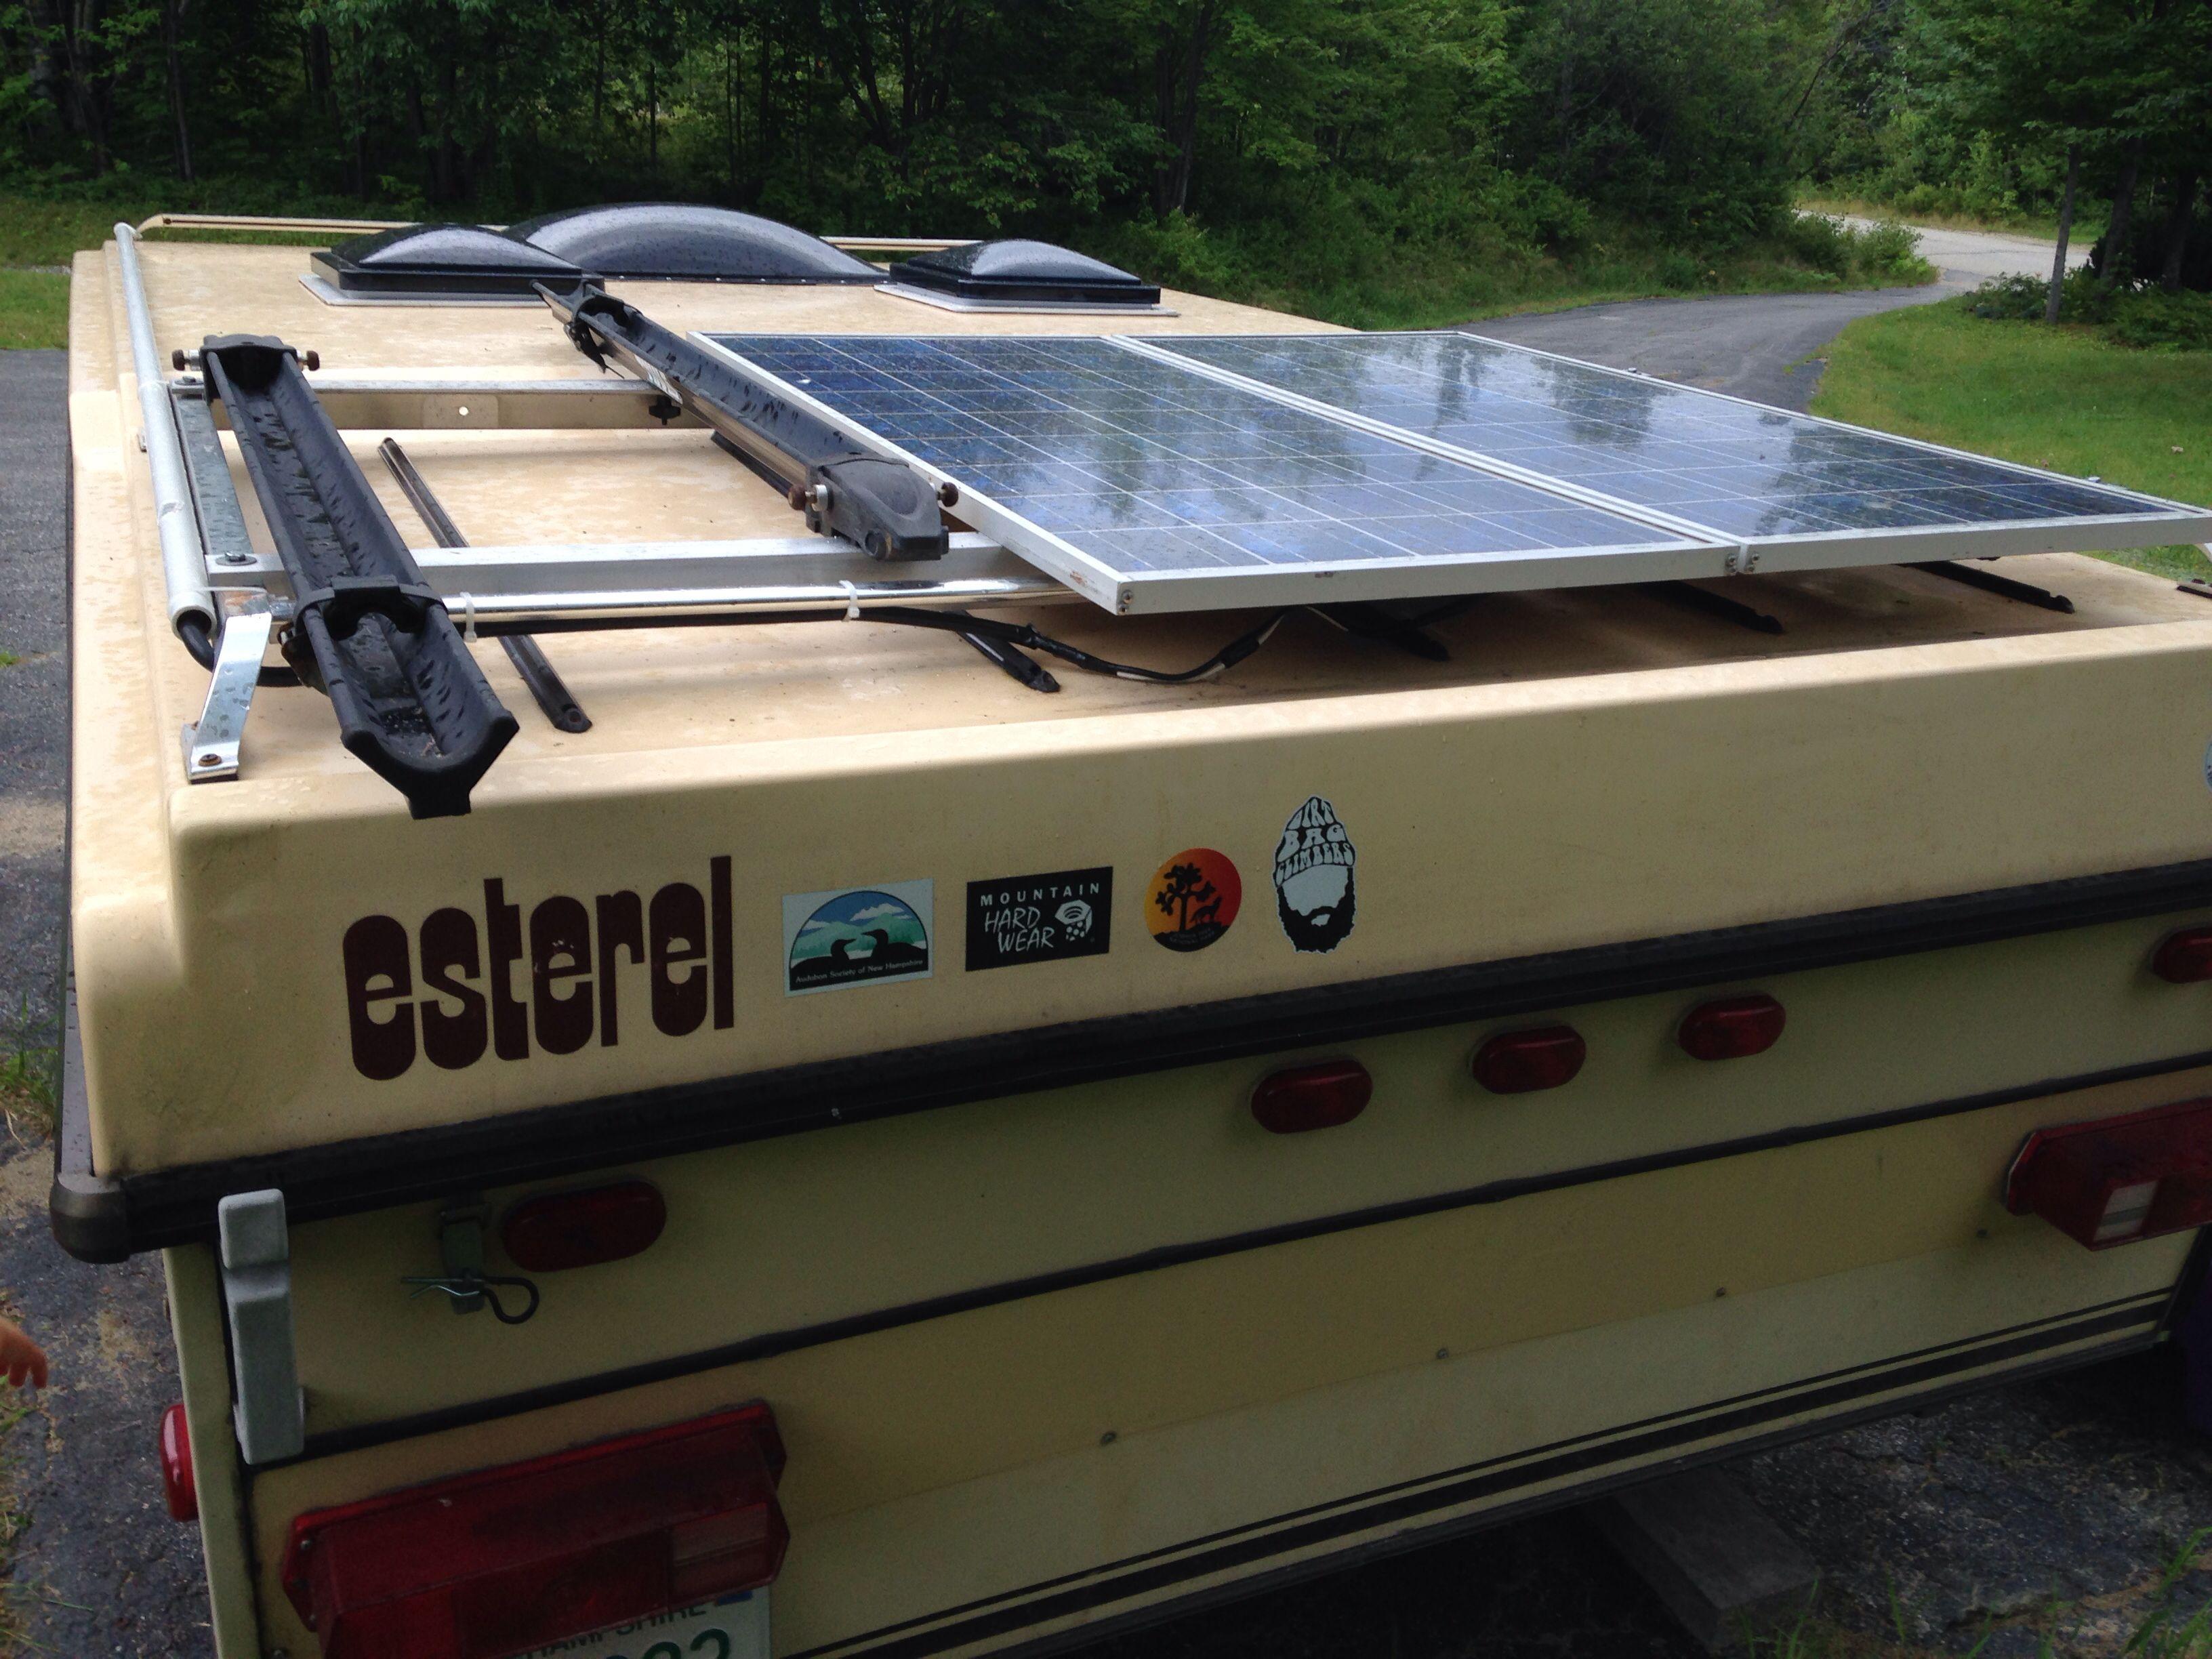 Bike racks and solar panel on Esterel folding caravan